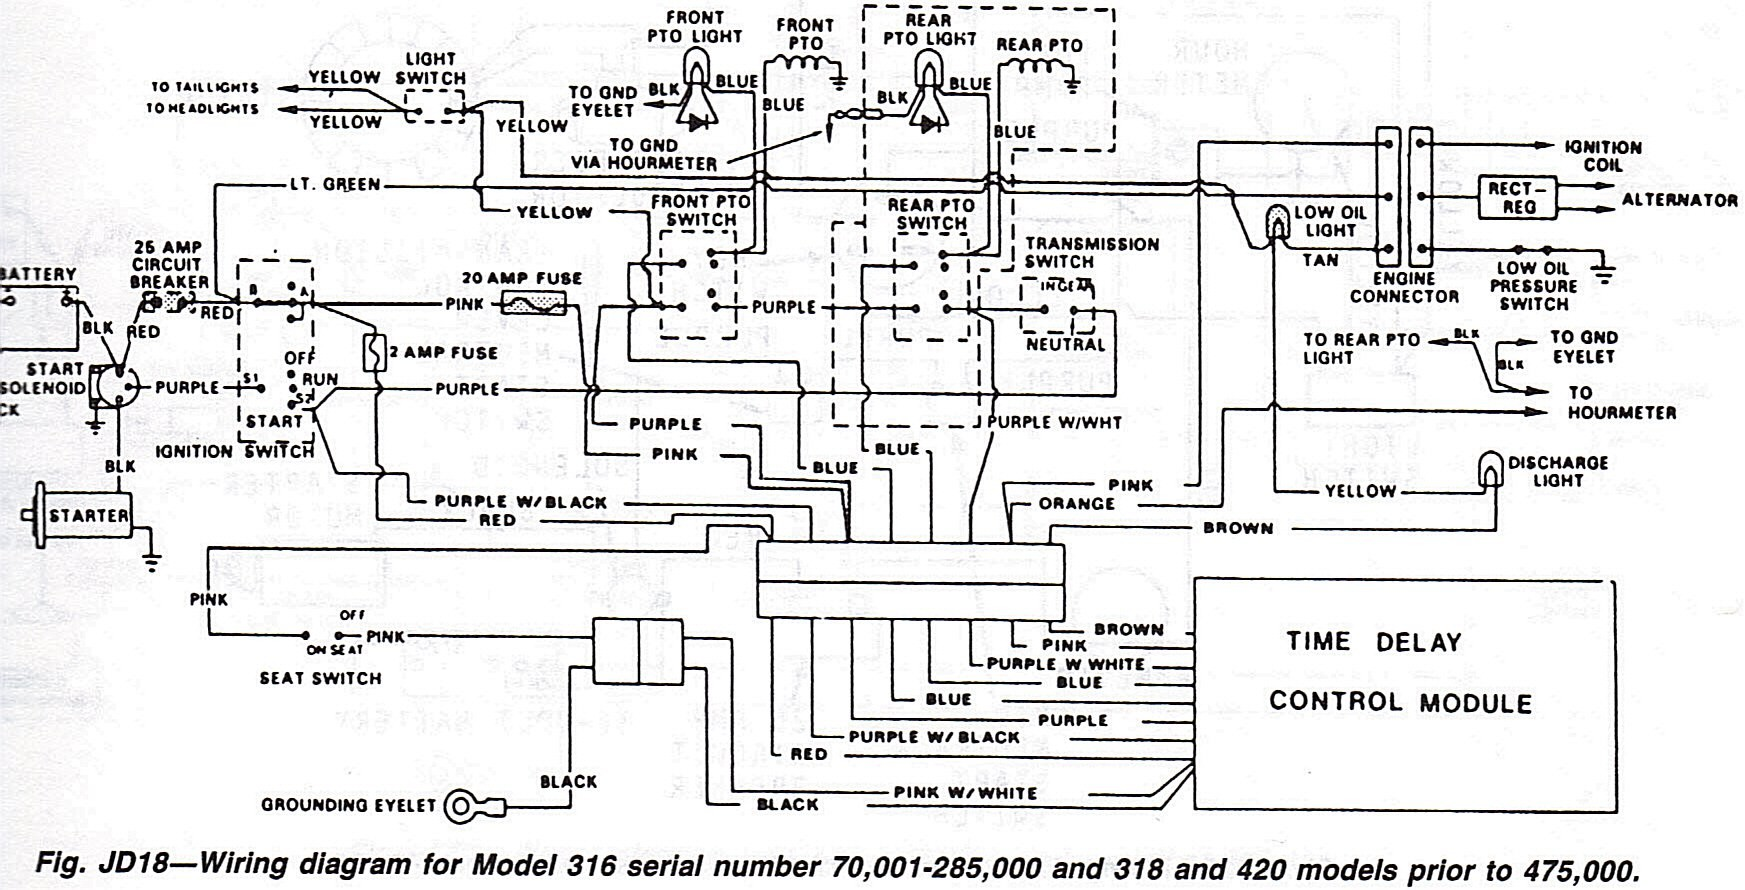 hight resolution of john deere wiring schematic 302 88 sechematic motor gator l120 pto